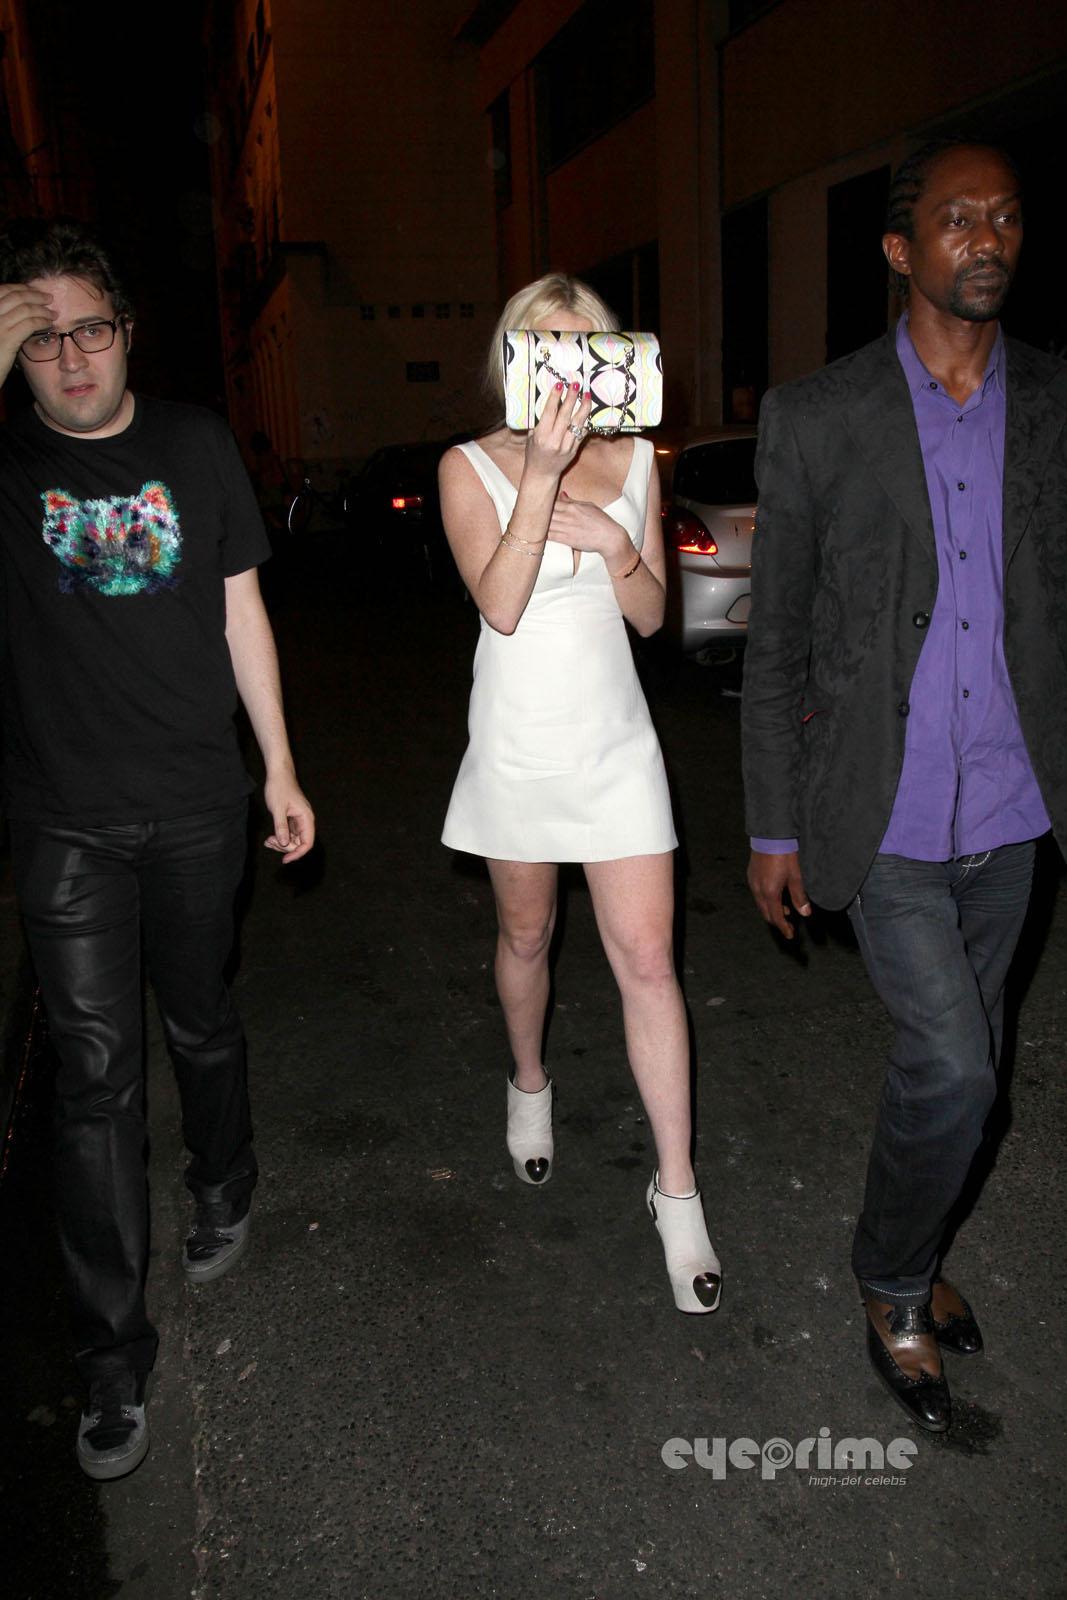 Lindsay Lohan: Upskirt as she leaves a Club in Paris, Sep 30